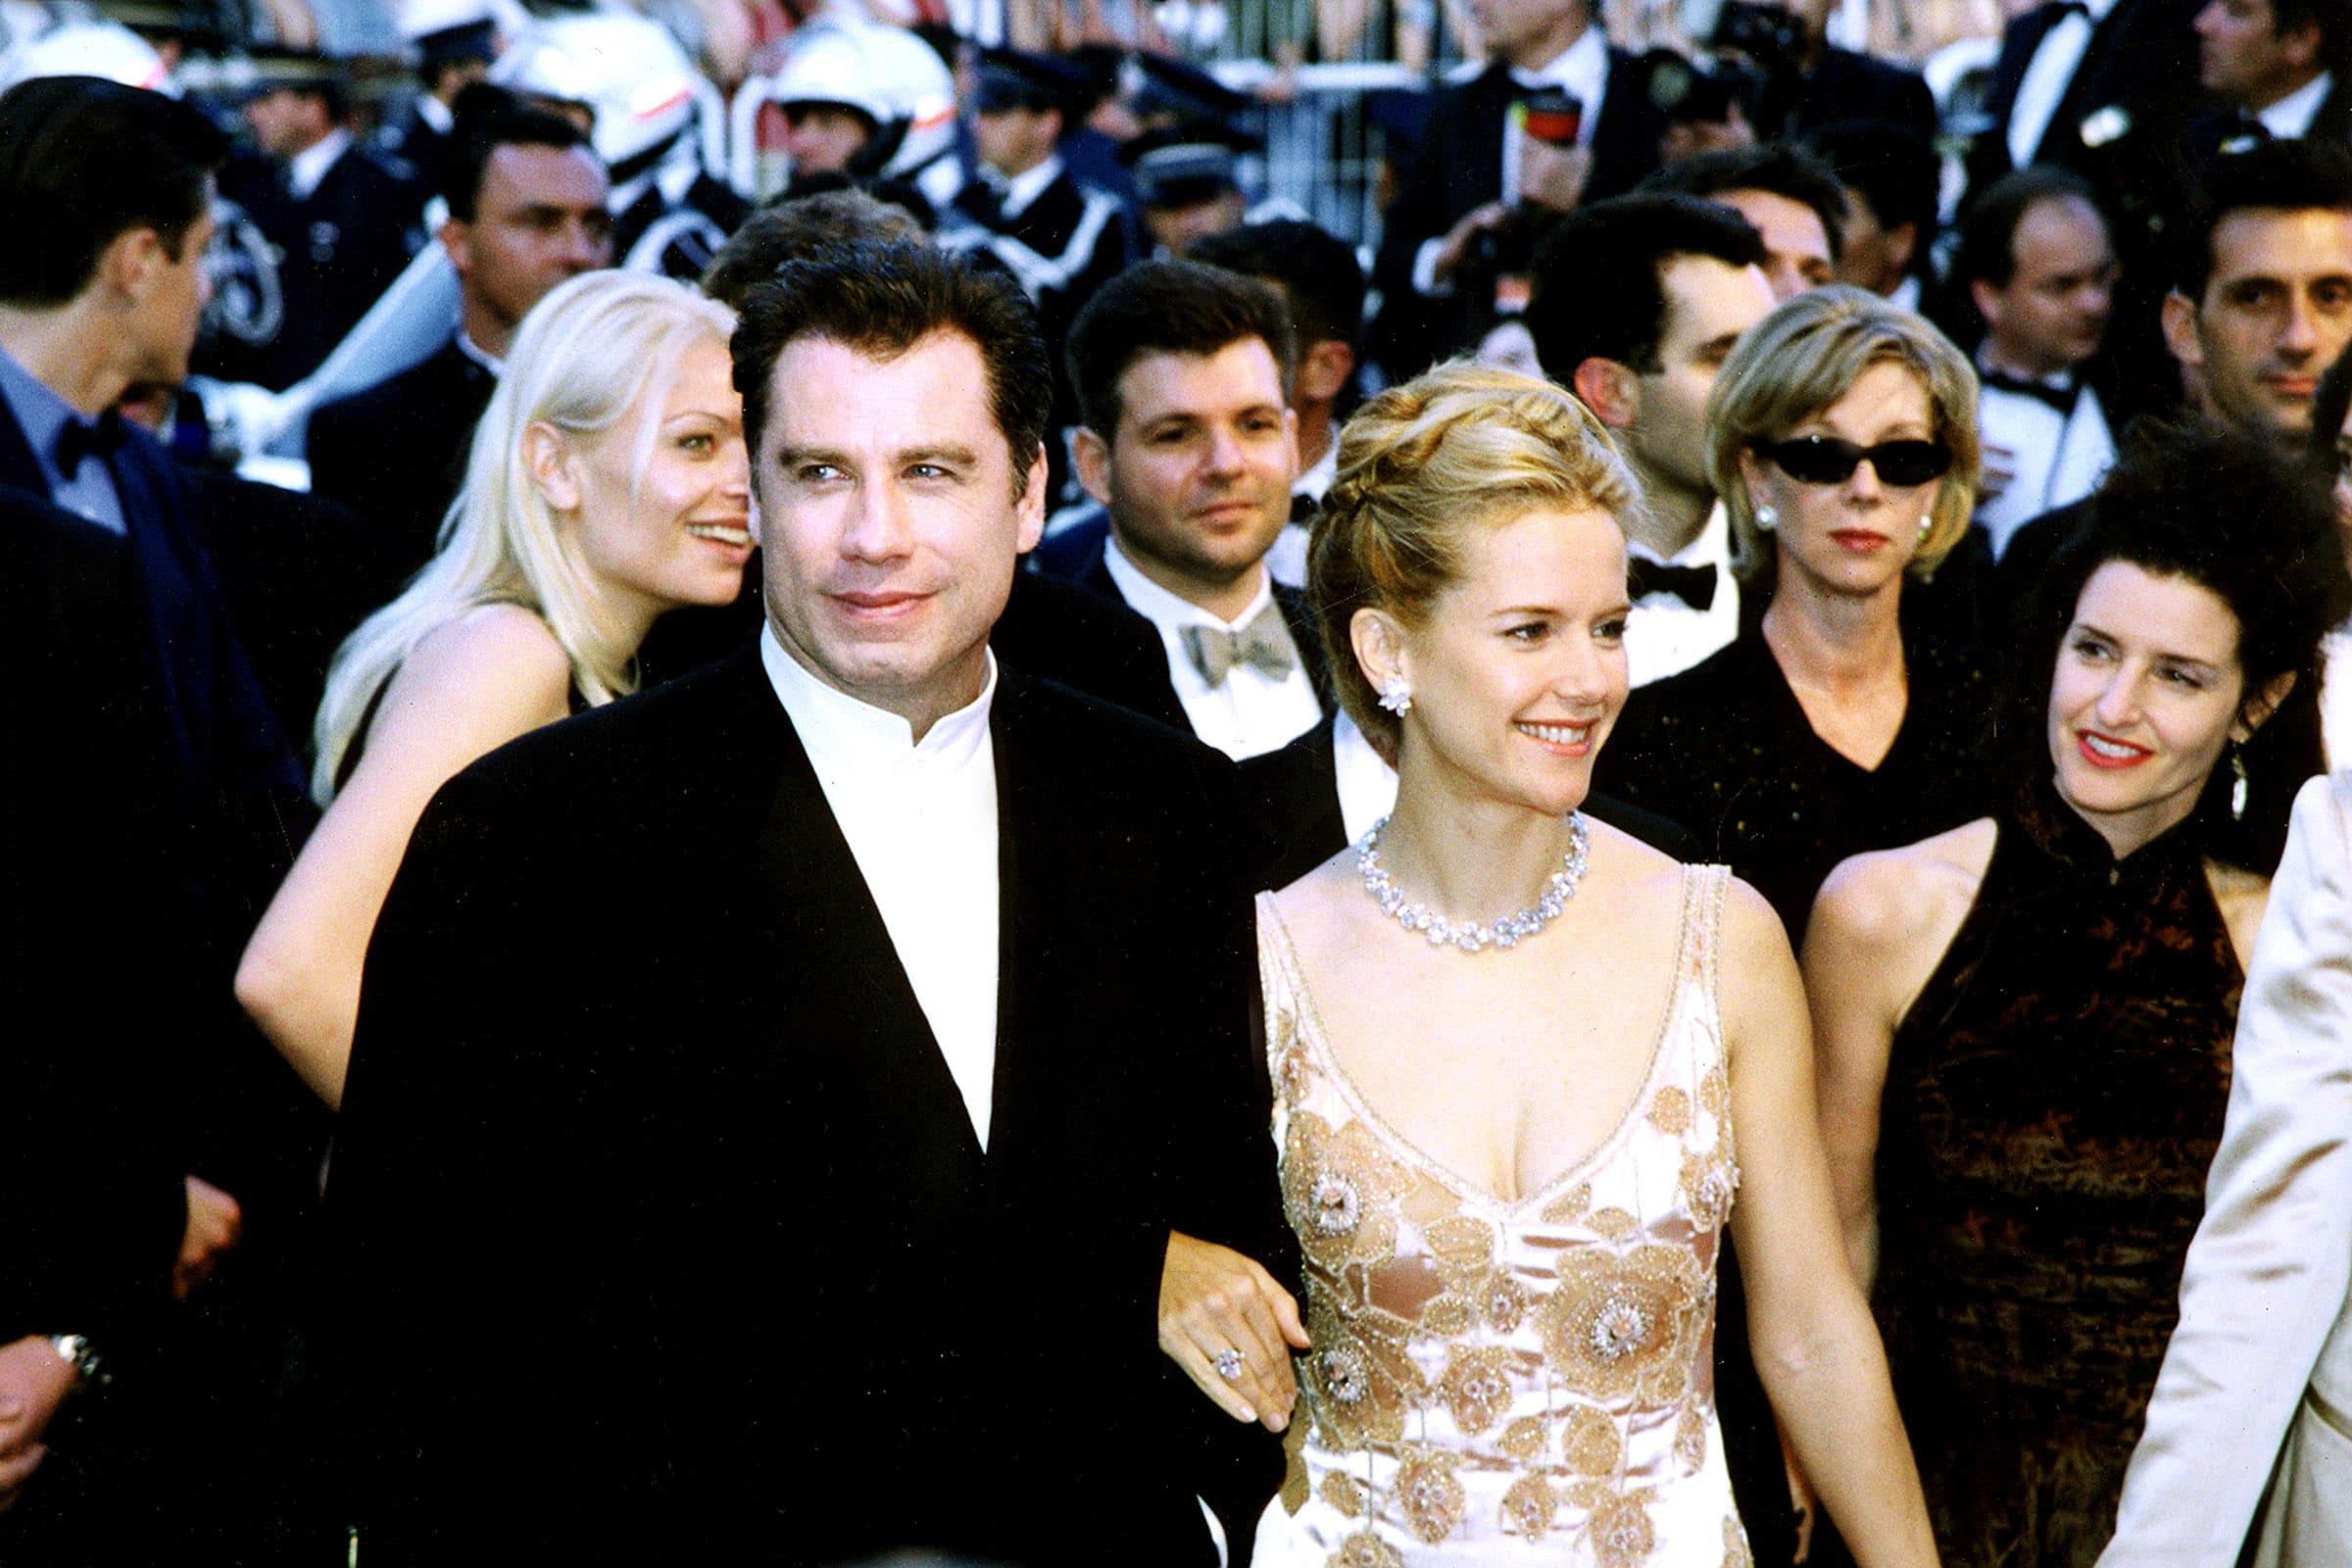 John Travolta, Kelly Preston at Cannes Film Festival, 1998